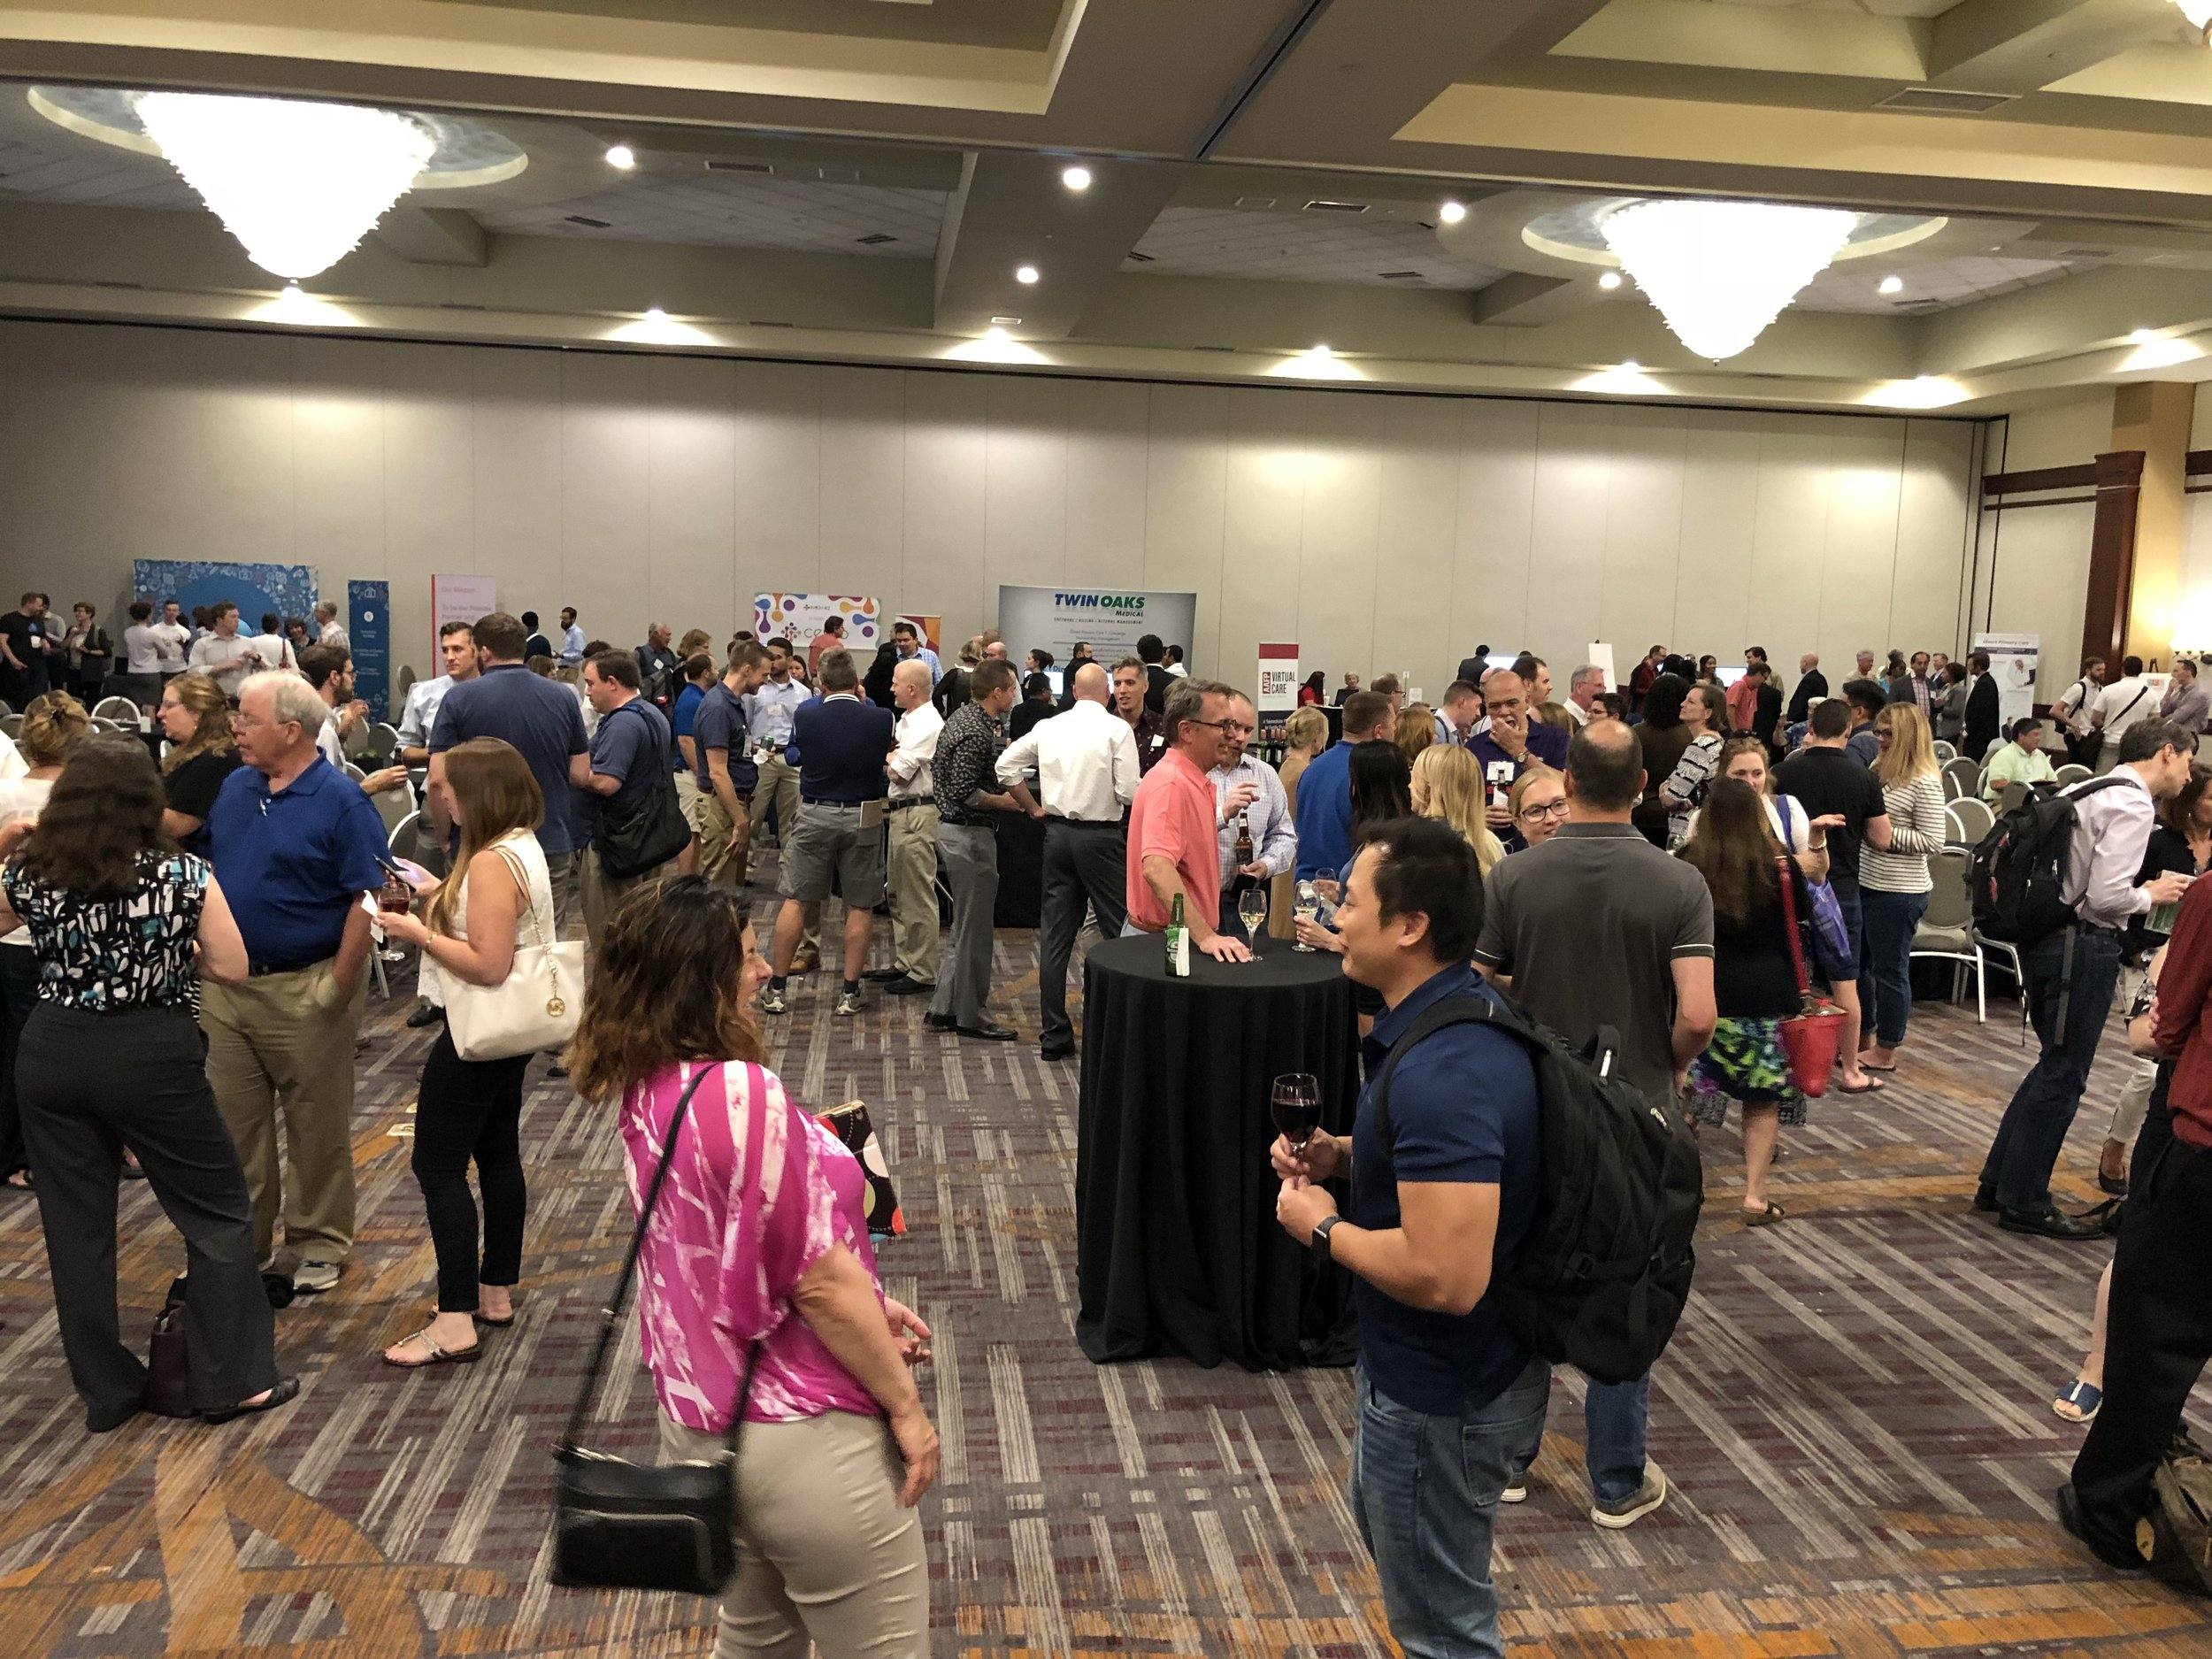 2018.07.15 DPC Hustles Harder AAFP Summit 2018 Happy Hour.jpg